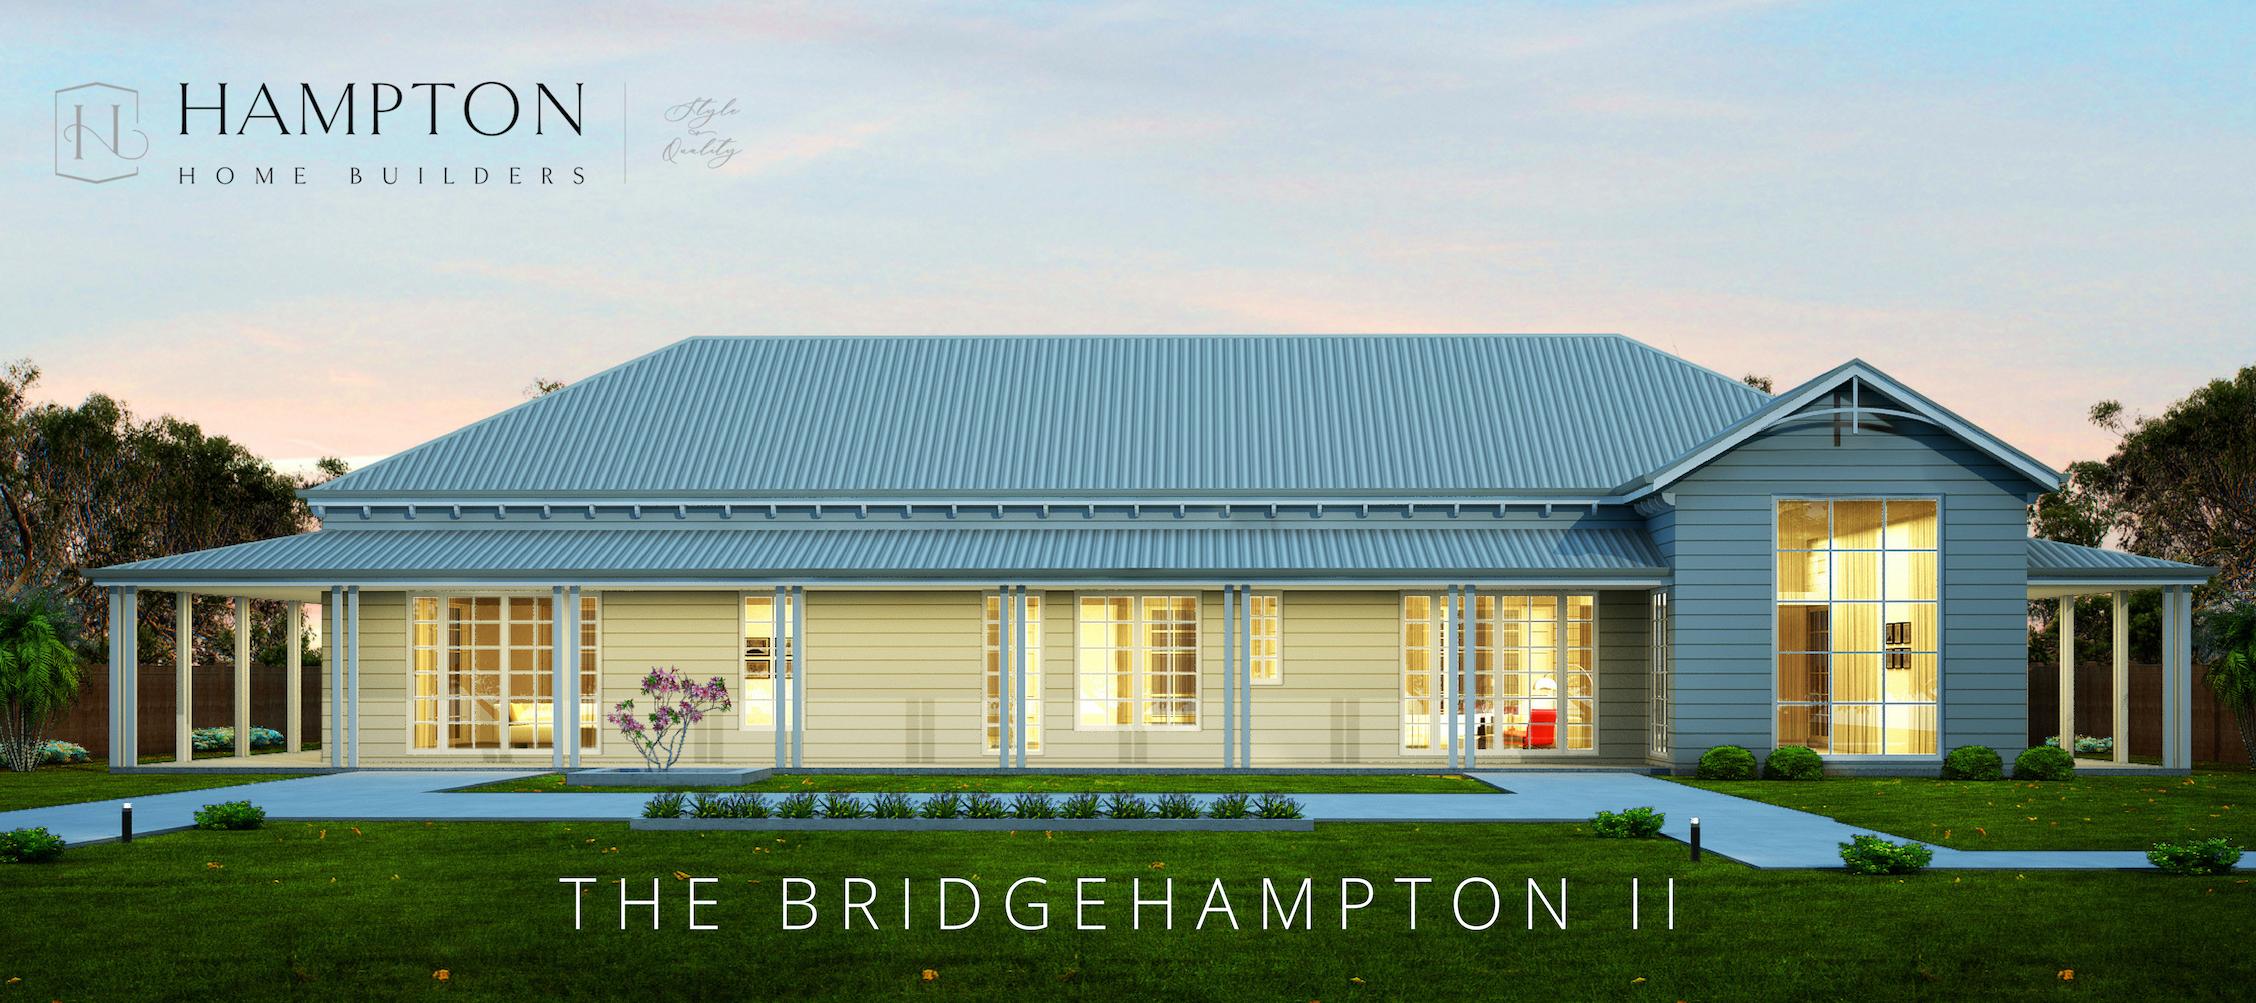 The Bridgehampton II